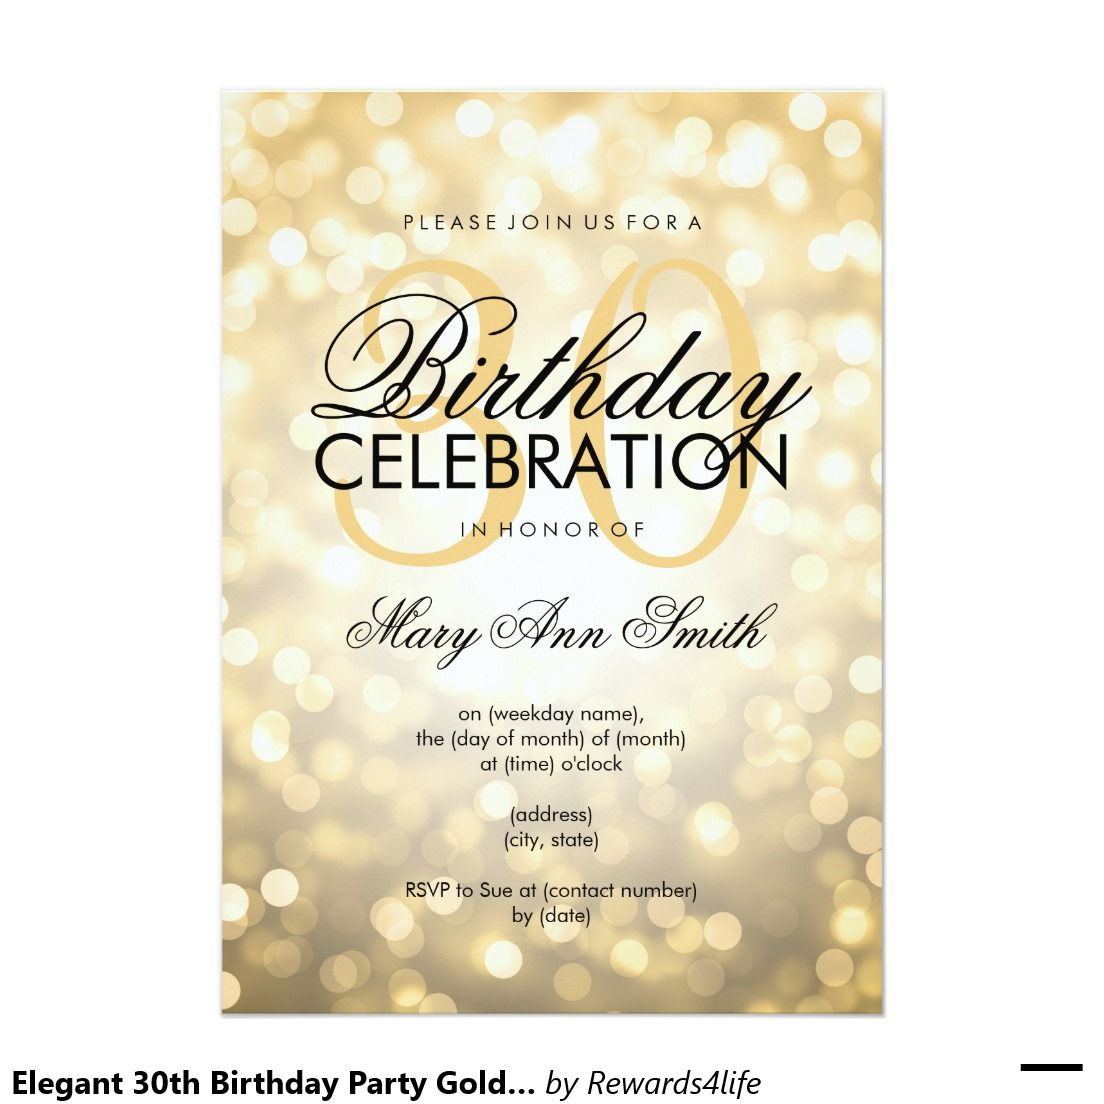 Elegant 30th Birthday Party Gold Glitter Lights Invitation Zazzle Com Elegant Birthday Invitations 30th Birthday Parties 60th Birthday Party